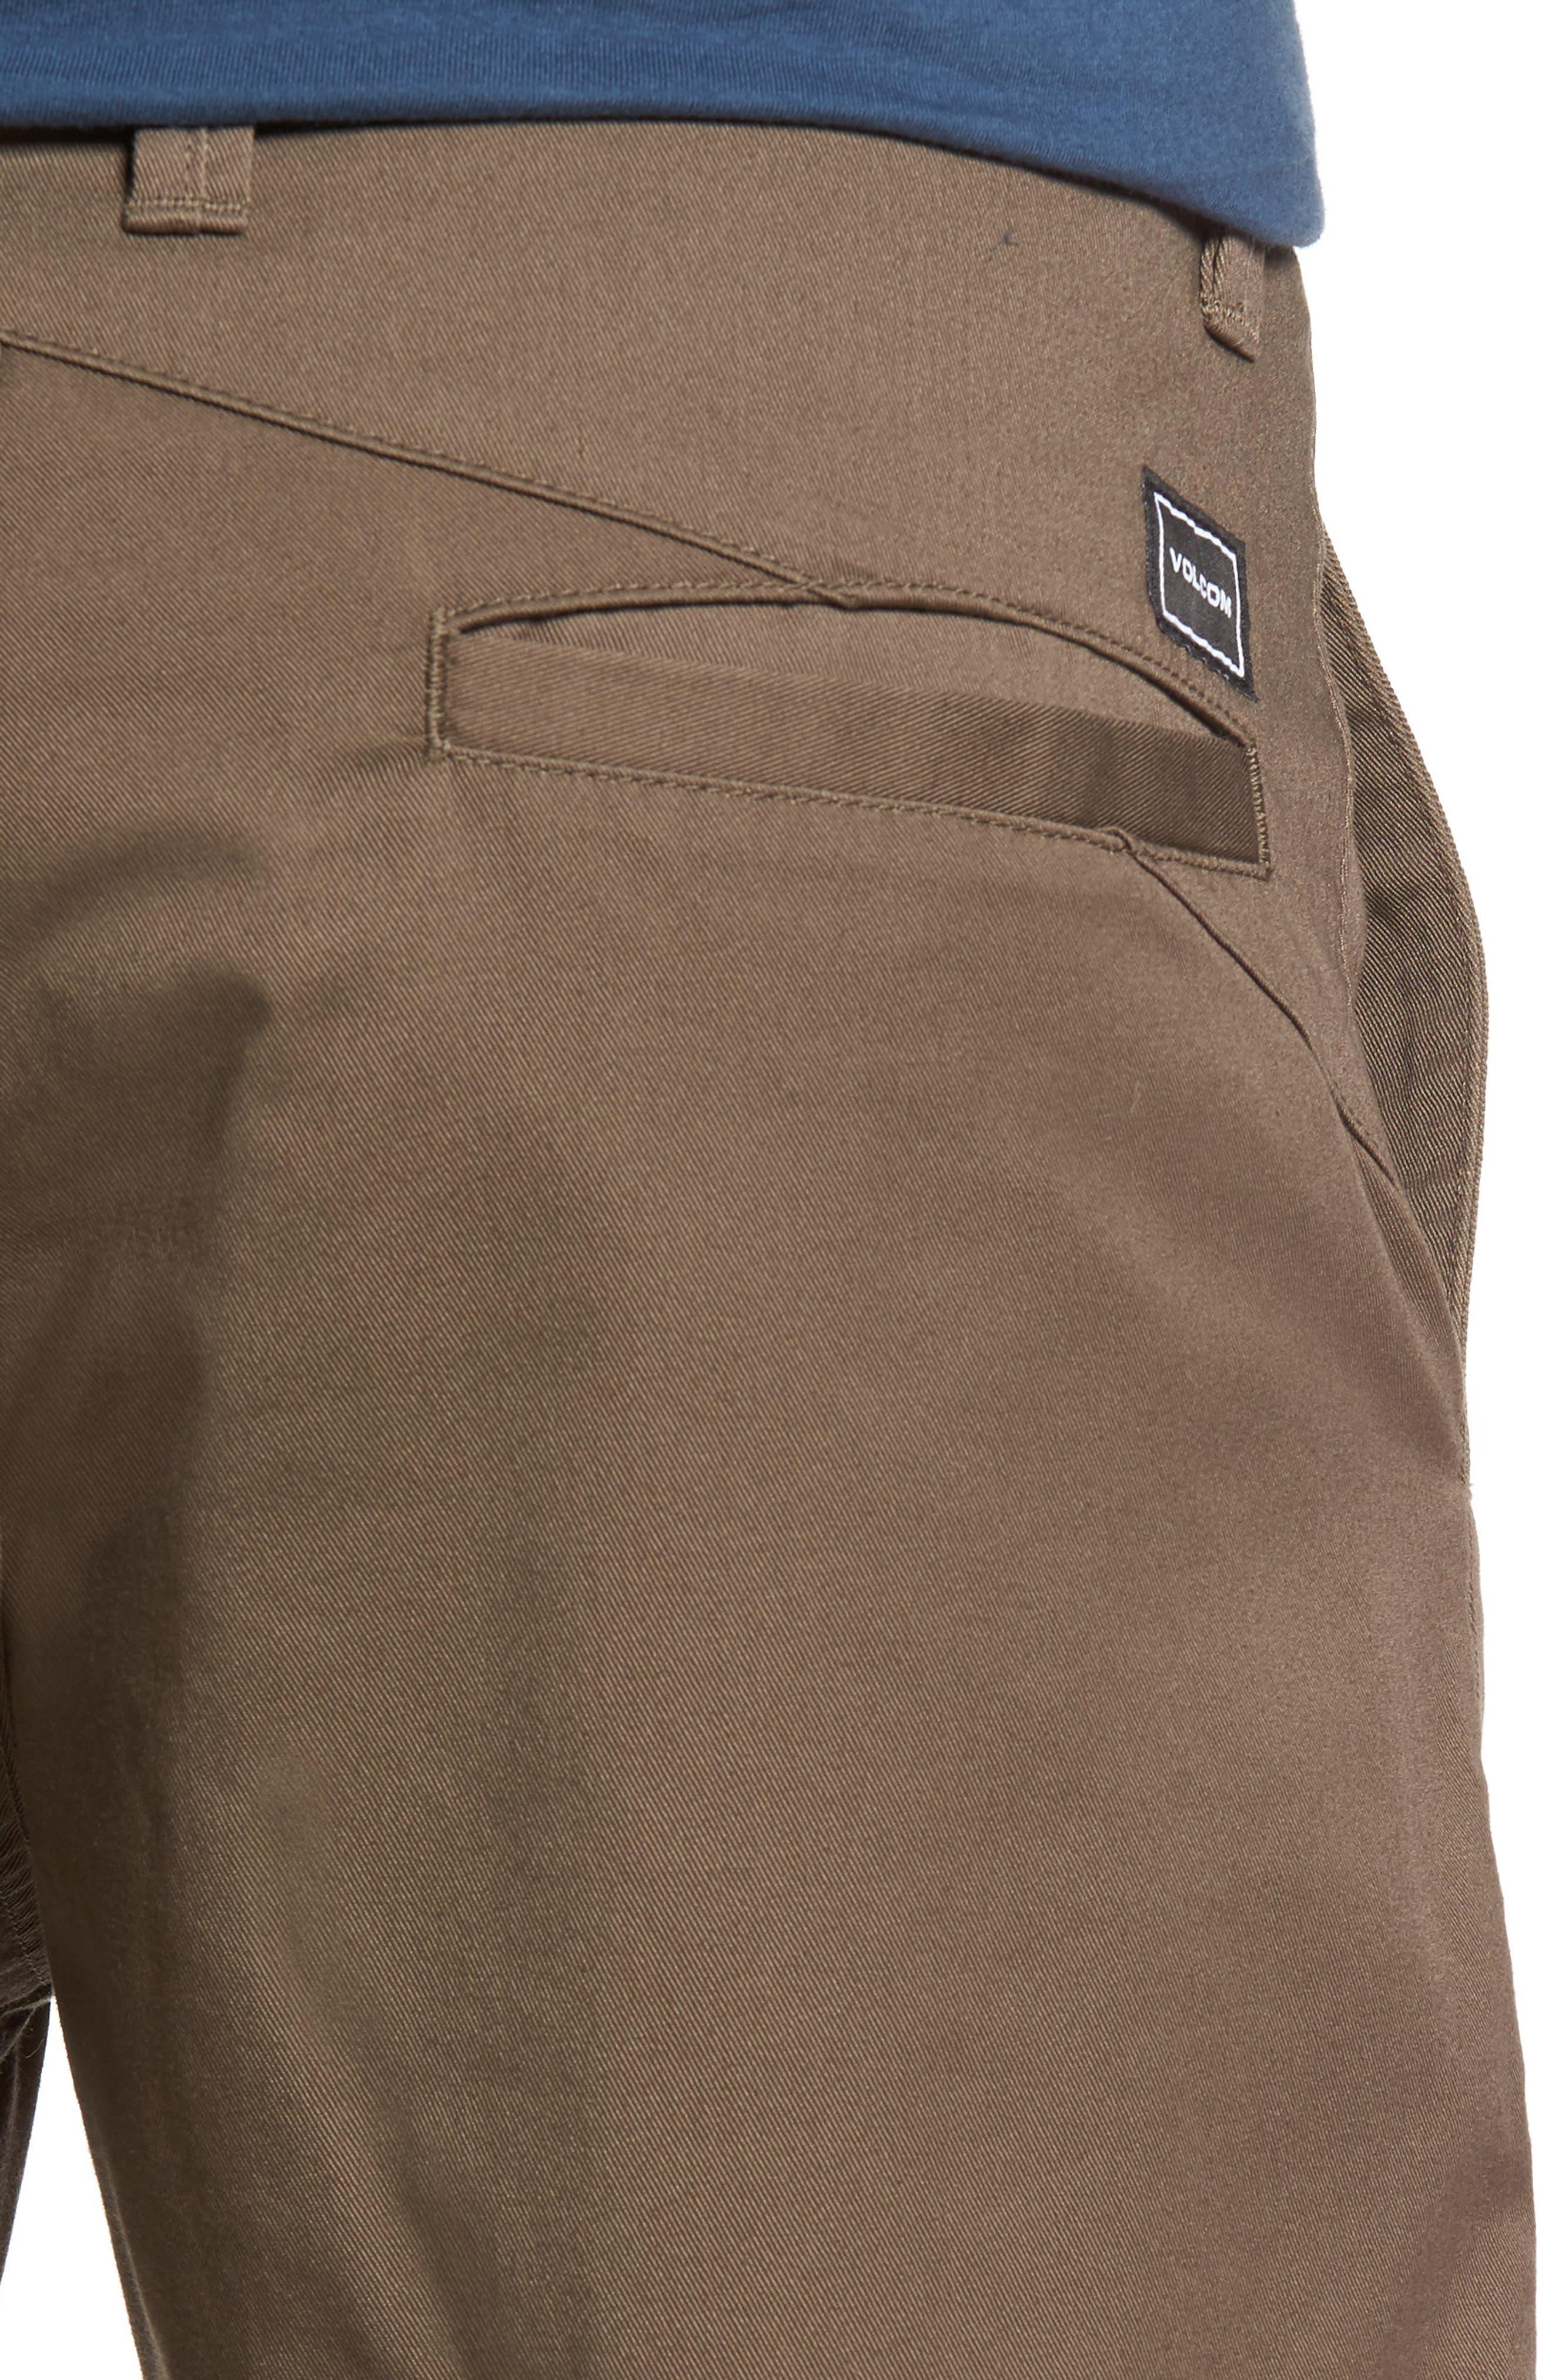 Modern Chino Shorts,                             Alternate thumbnail 4, color,                             MUSHROOM